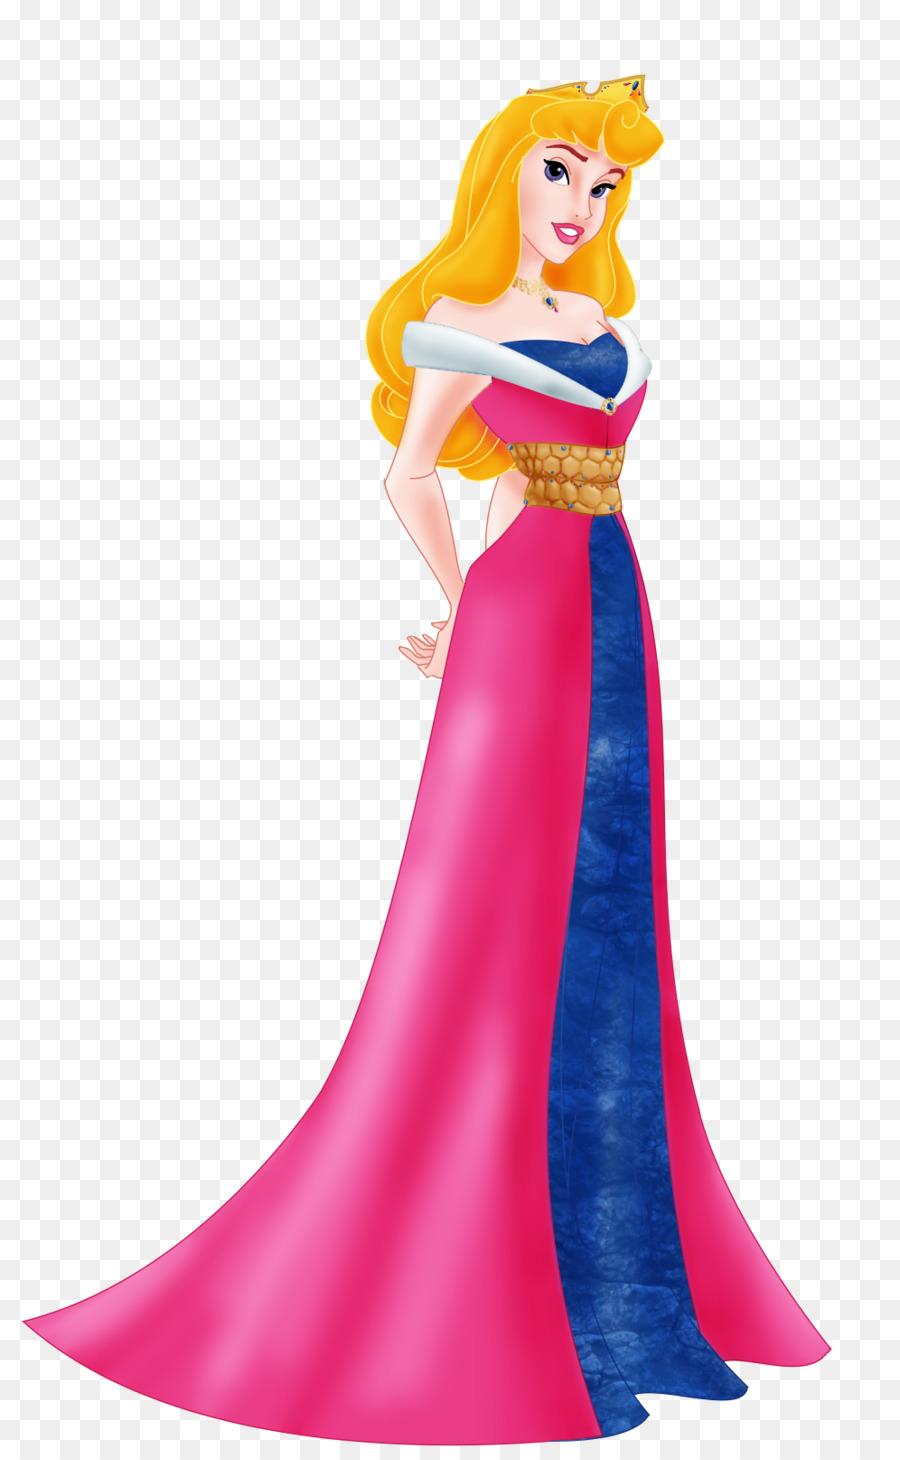 900x1460 Princess Aurora Belle Cinderella Middle Ages Disney Princess